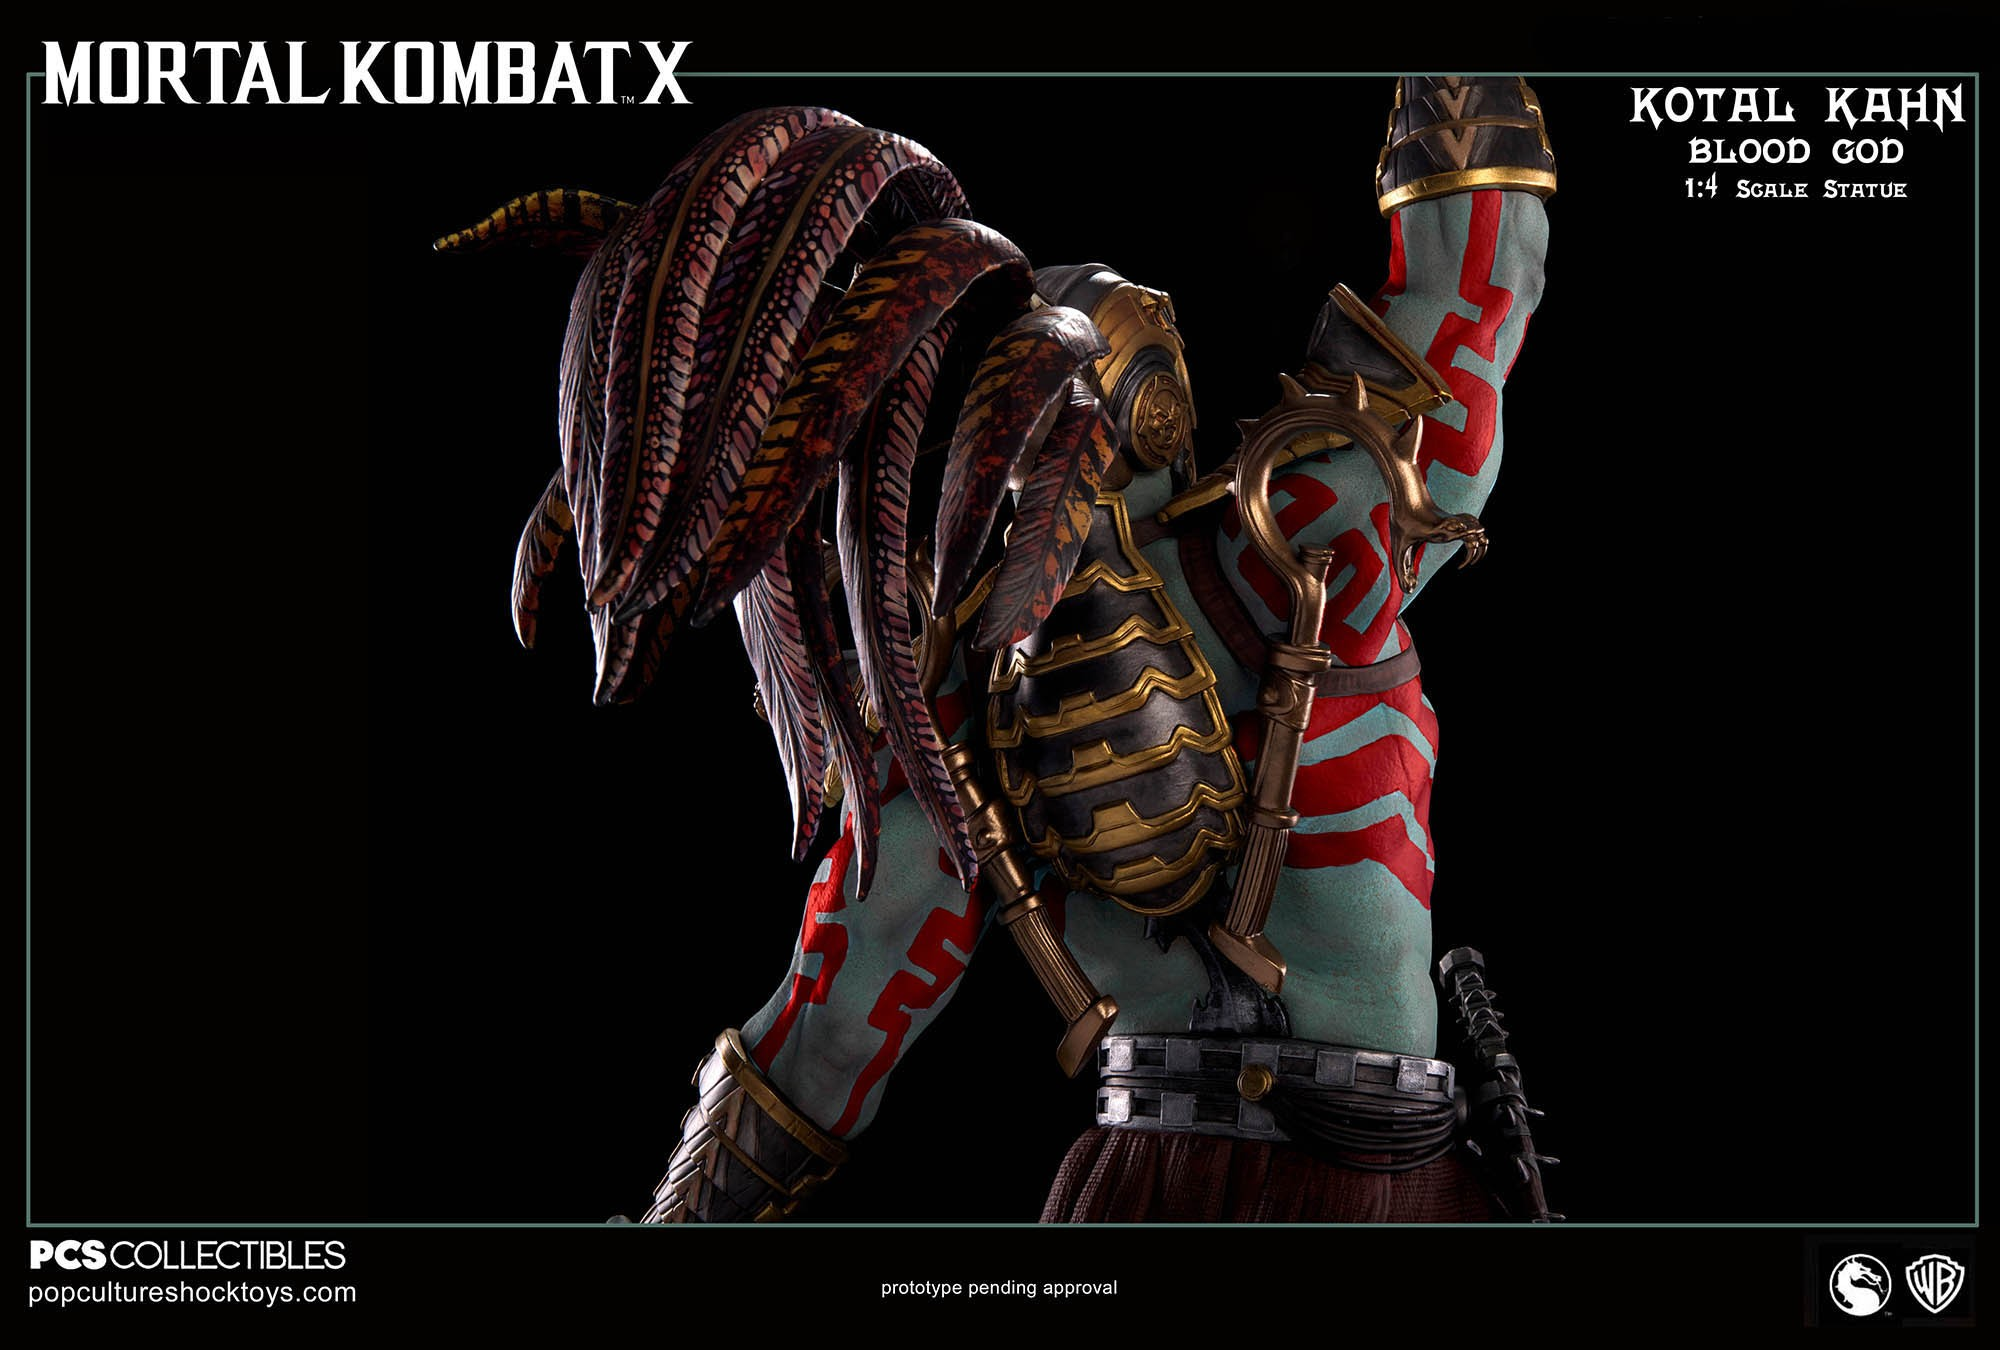 [Pop Culture Shock] Mortal Kombat X: Kotal Kahn 1:4 scale PCS-Kotal-Kahn-Blood-God-016